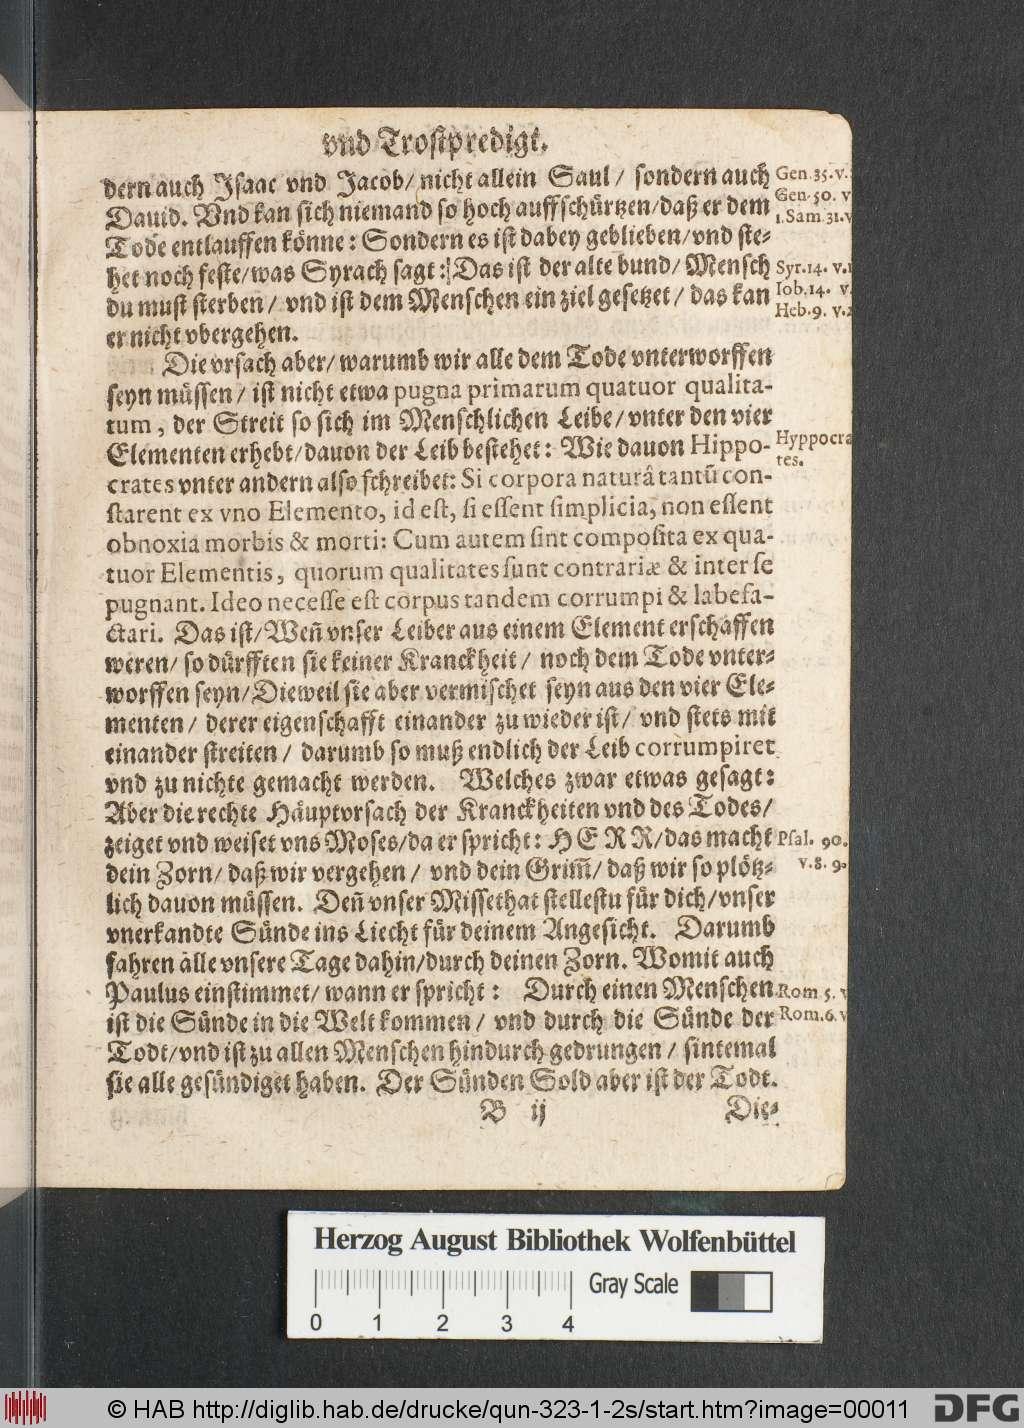 http://diglib.hab.de/drucke/qun-323-1-2s/00011.jpg